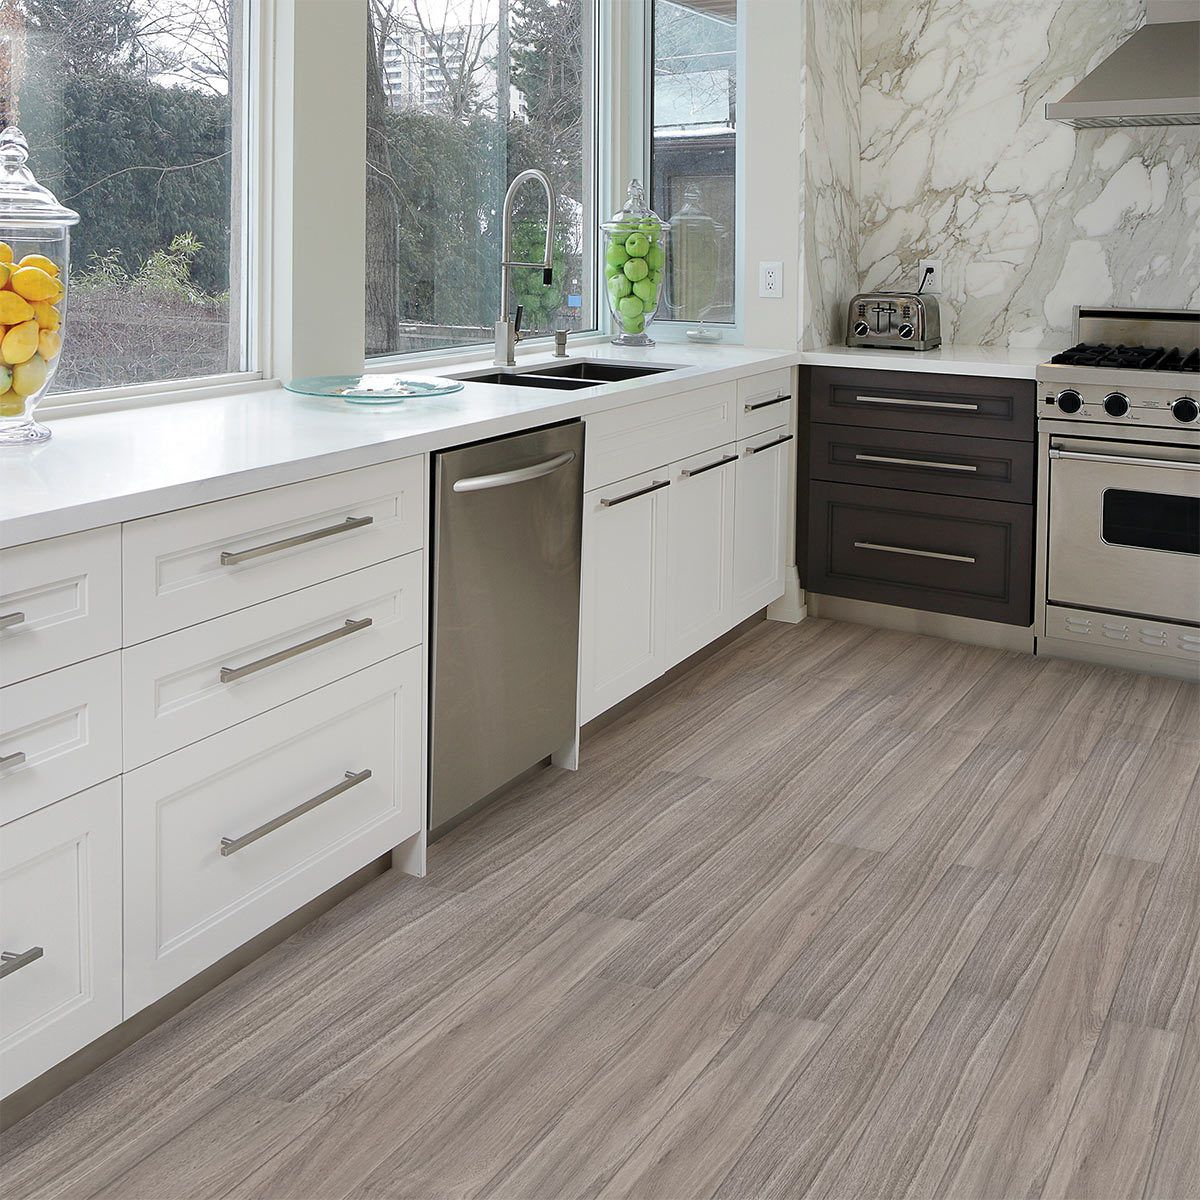 Golden Select Oyster Rigid Core Spc Luxury Vinyl Flooring Planks With Foam Underlay 1 55 M Per Pack Vinyl Flooring Luxury Vinyl Flooring Kitchen Flooring